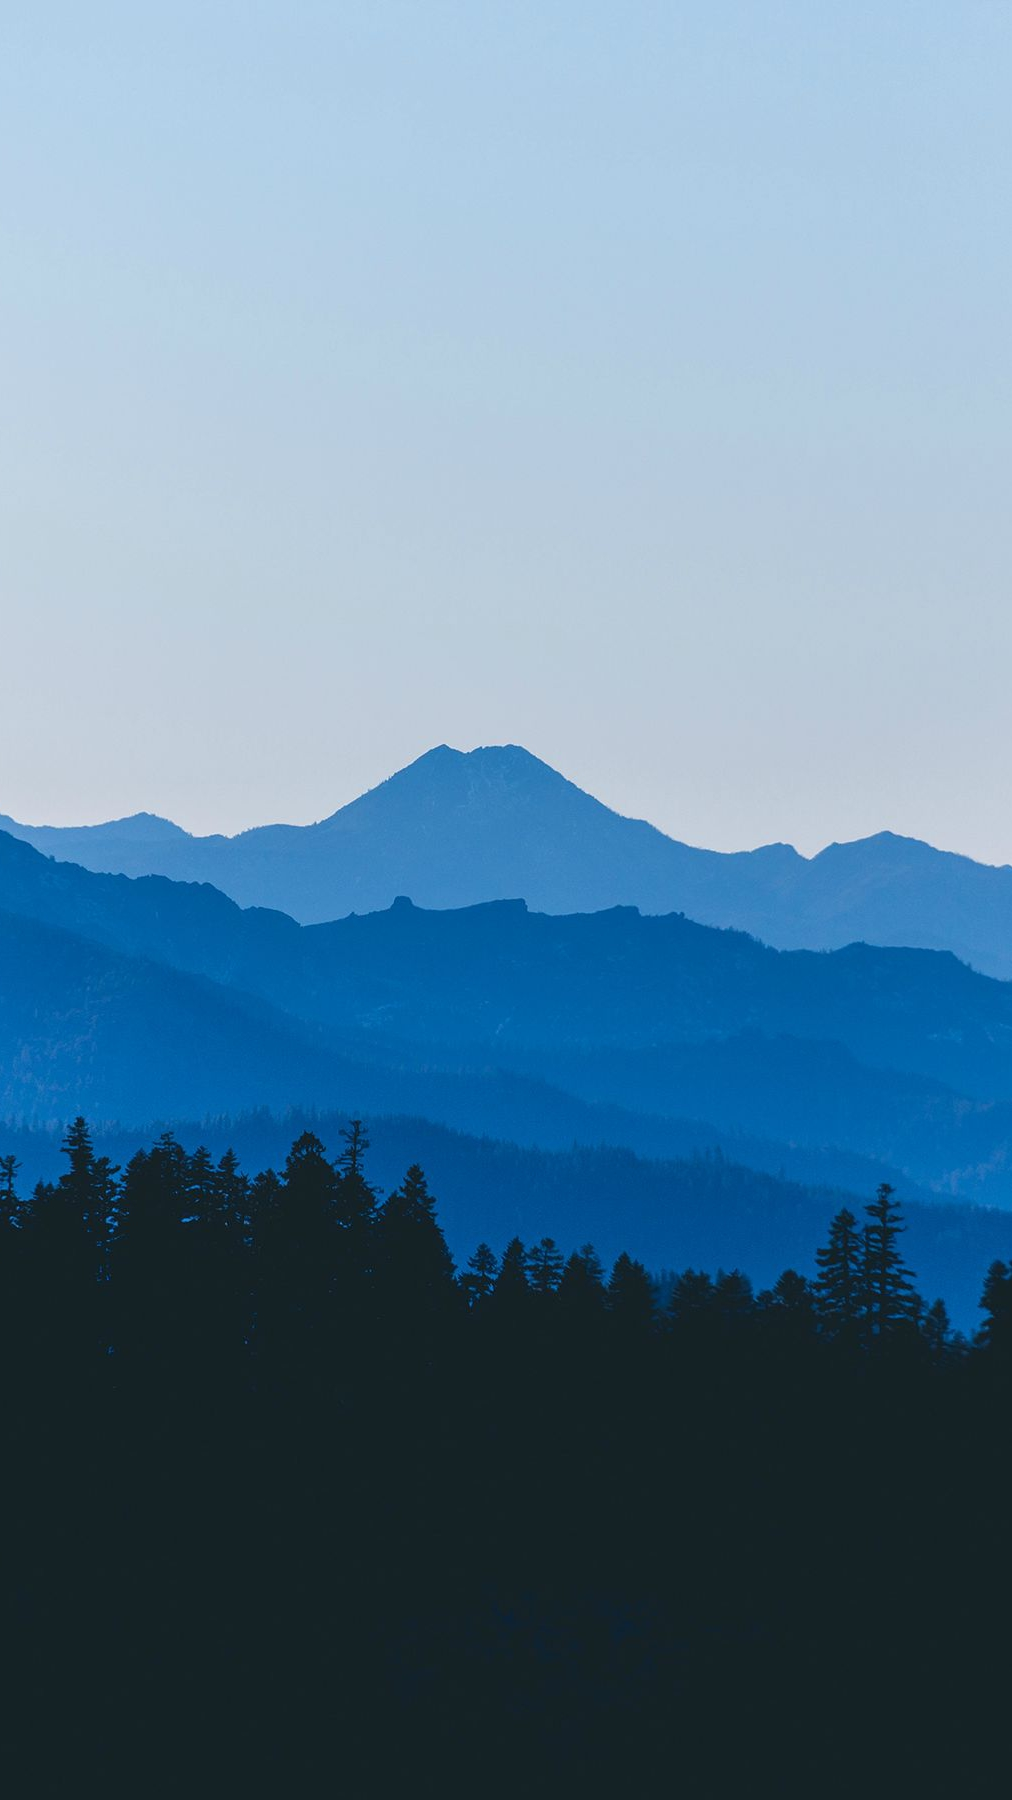 Great Wallpaper Mountain Dark - Dark-Mountains-Fog-iPhone-Wallpaper-iphoneswallpapers_com  Graphic_82683.jpg